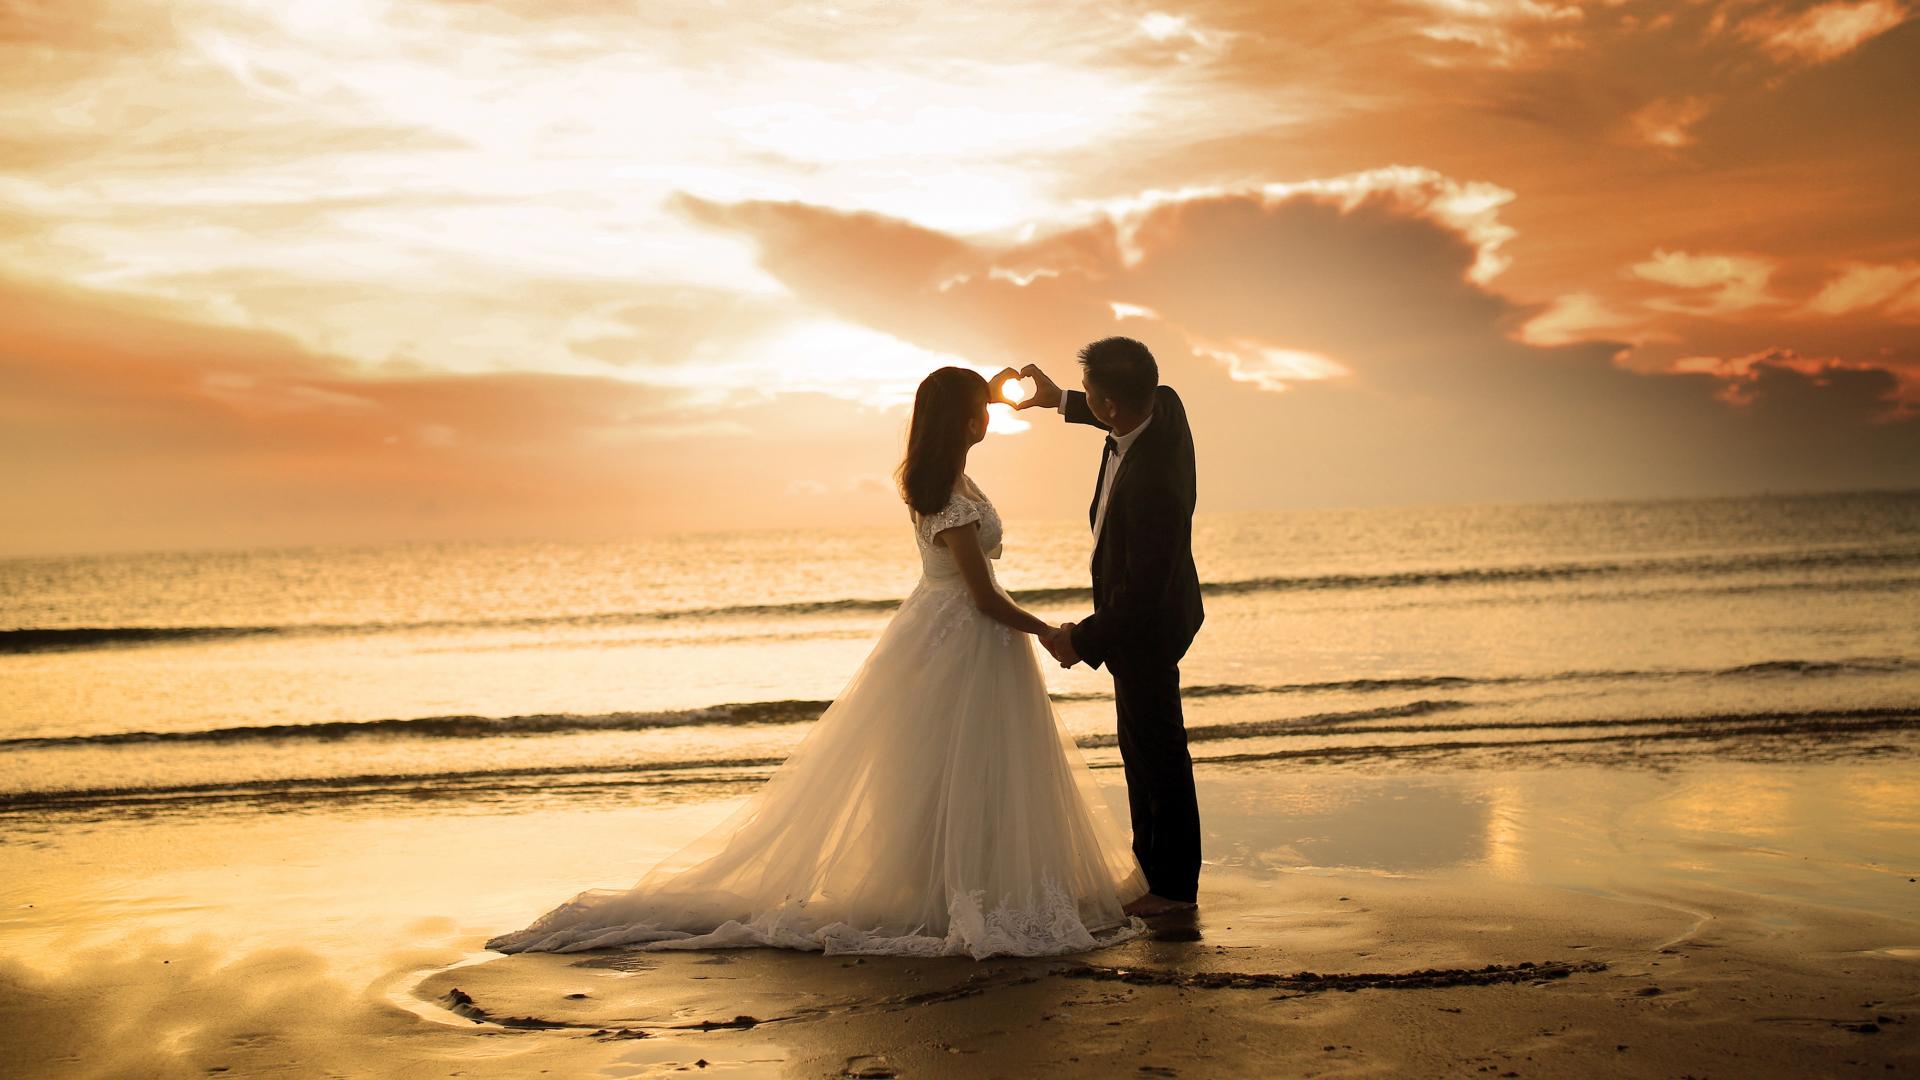 Download 1920x1080 Wallpaper Couple At Beach, Sunset, Love, Full Hd, Hdtv, Fhd, 1080p, 1920x1080 ...